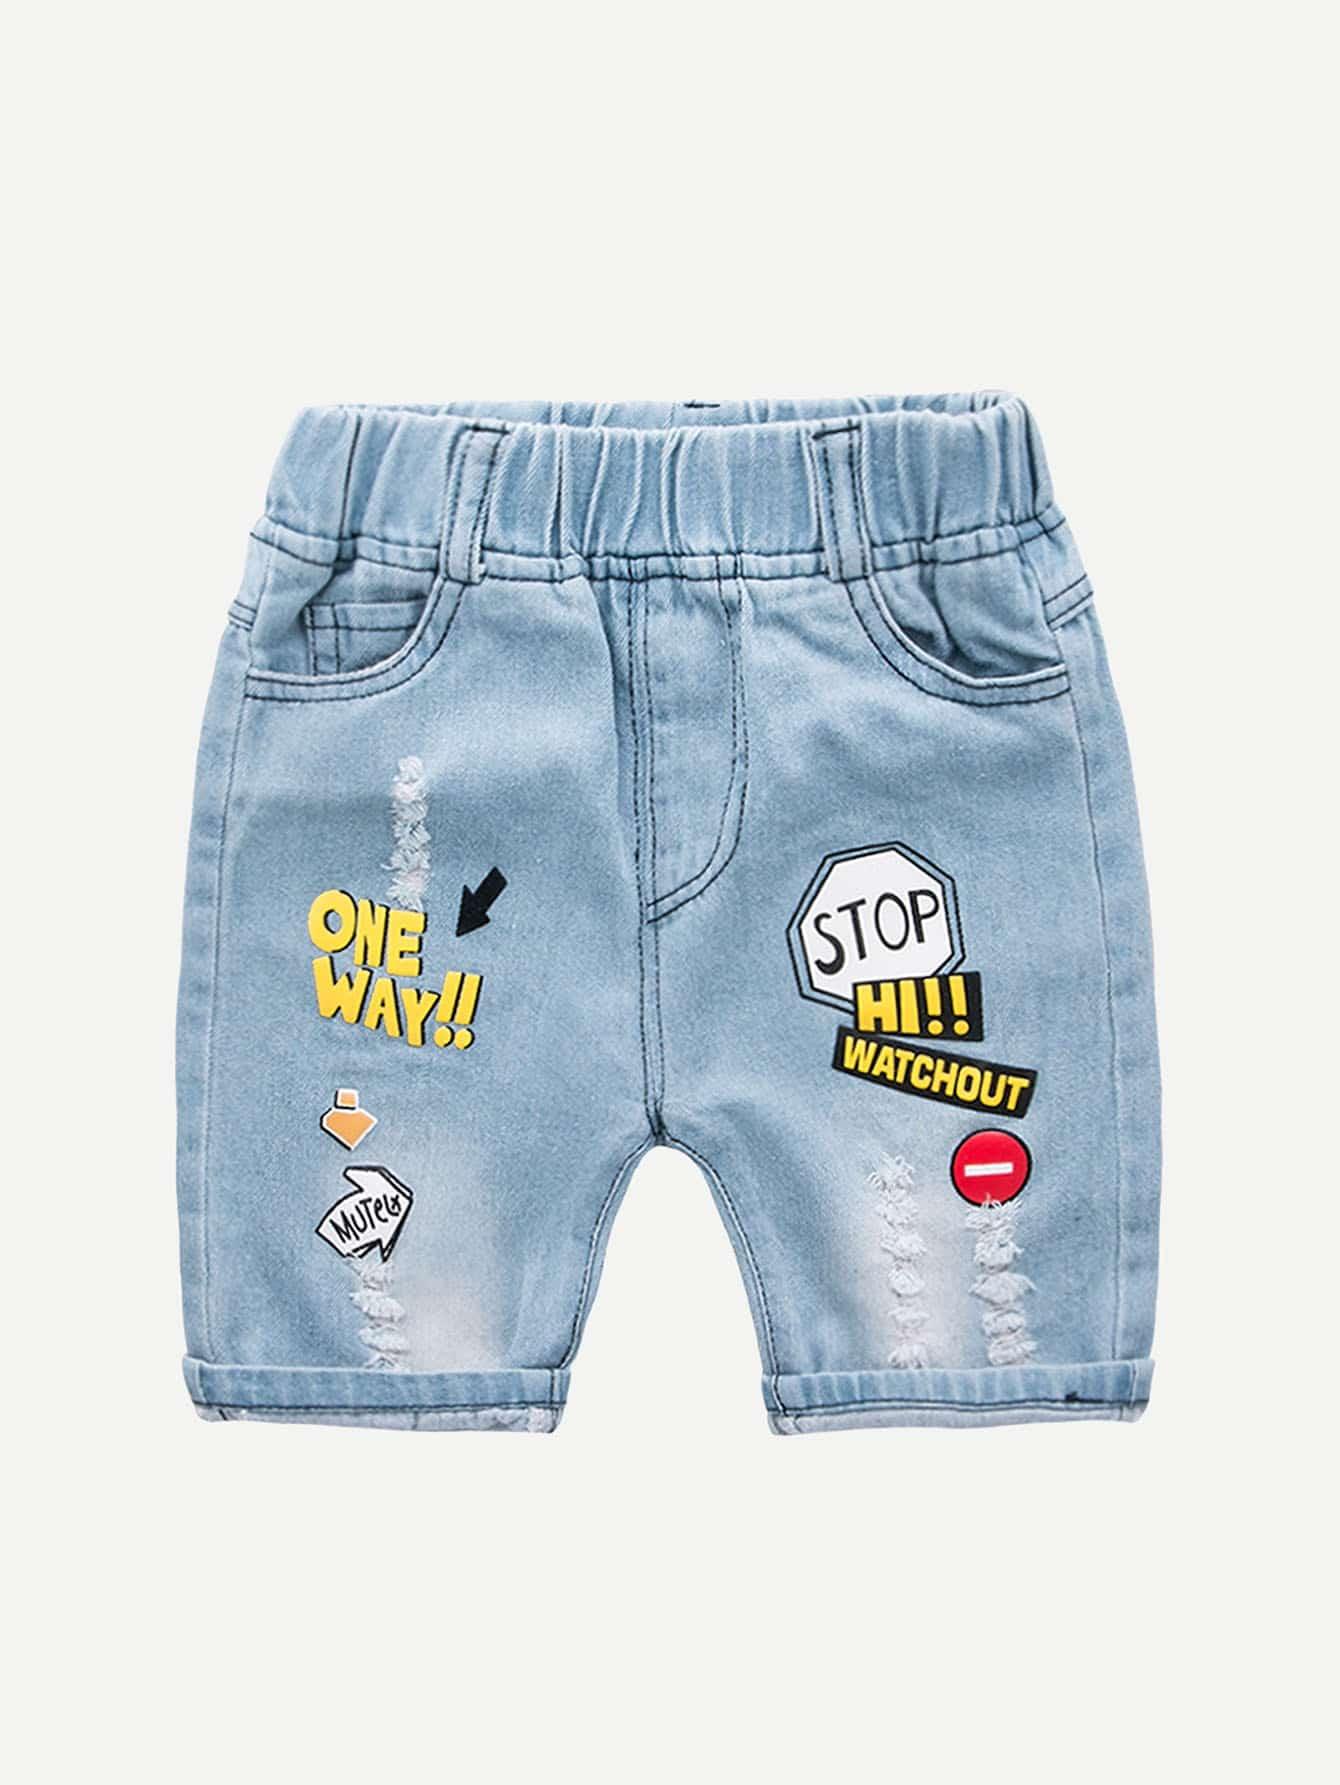 Boys Letter Print Destroyed Denim Shorts цена 2017